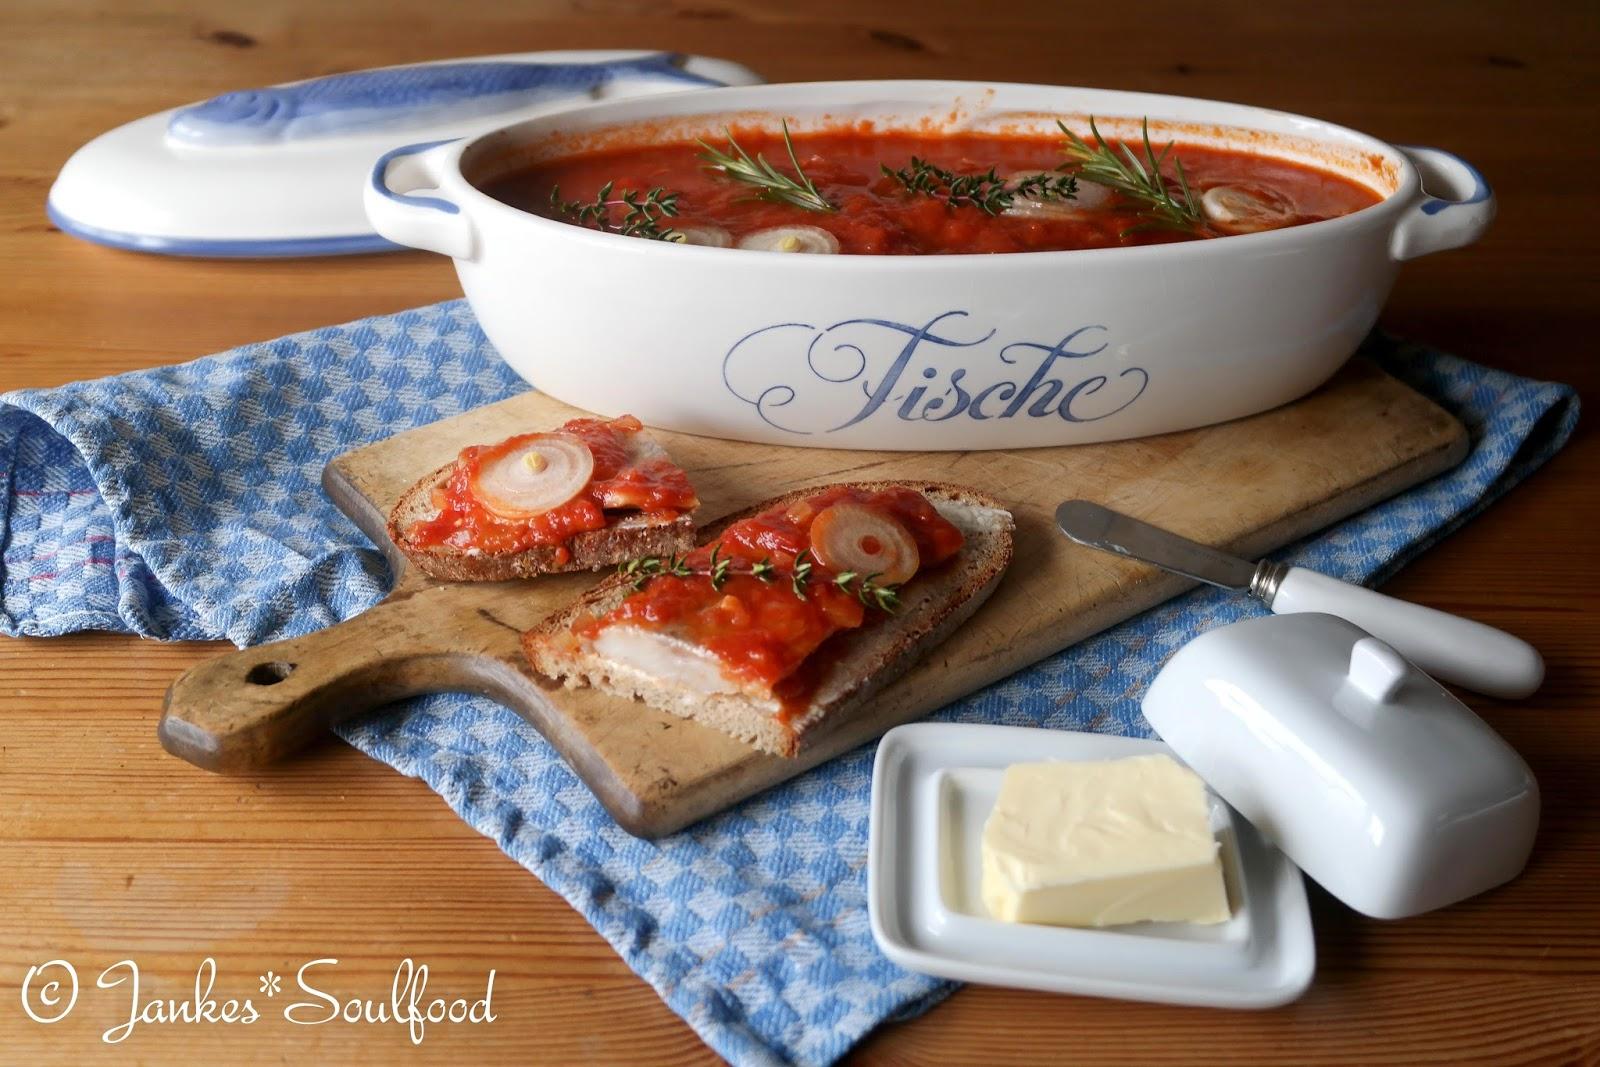 Heringsfilet in Tomatensauce selber machen